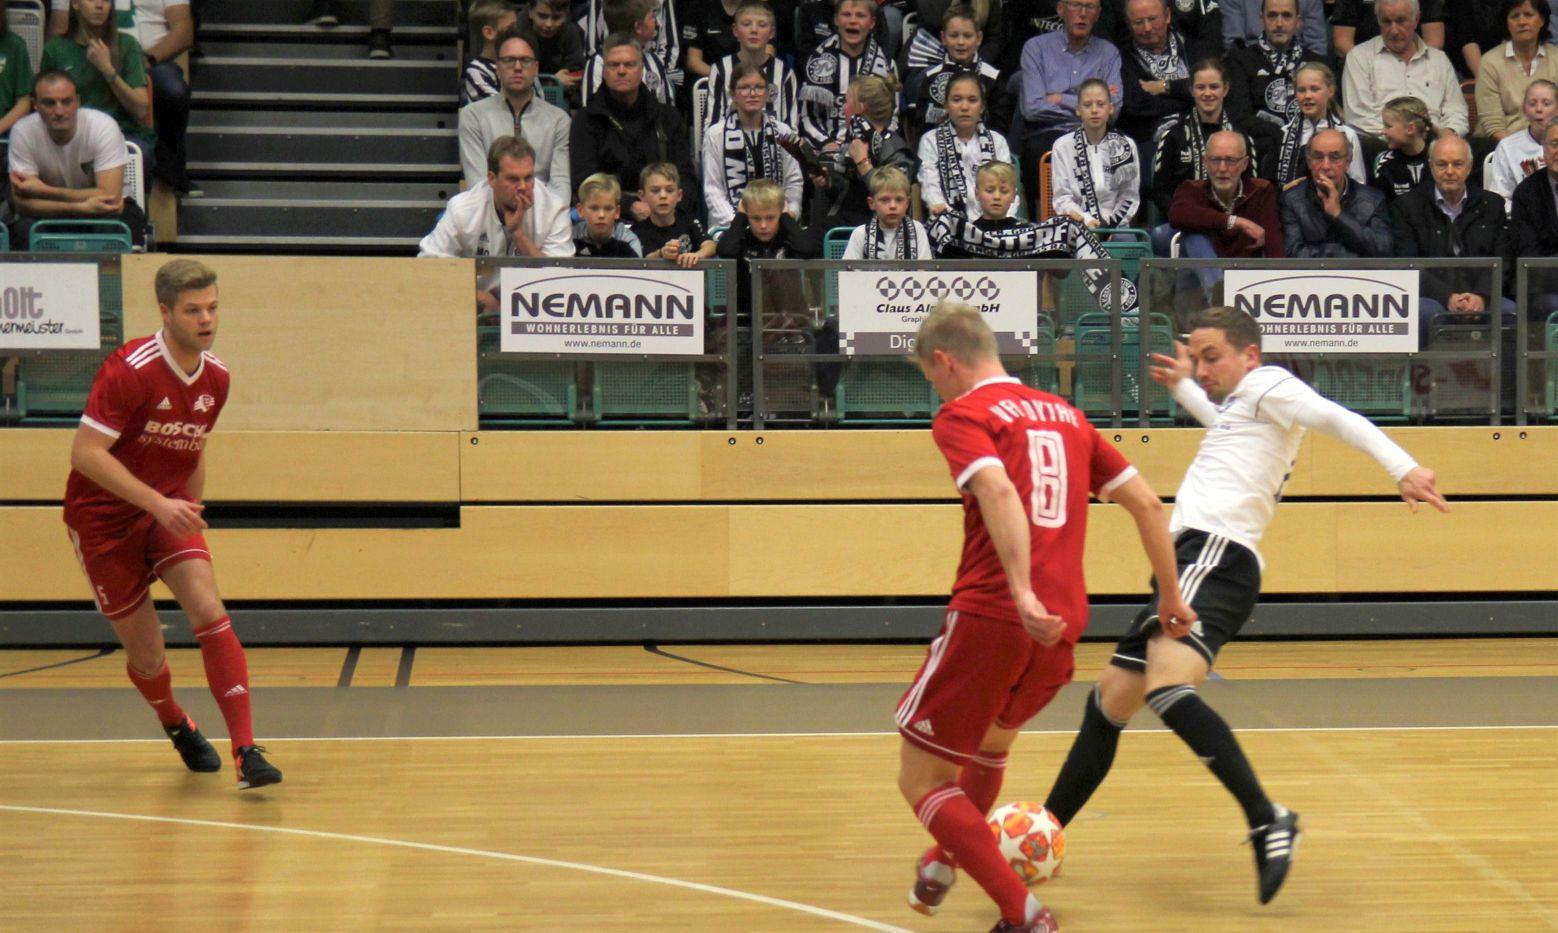 OV-Supercup-201219-001.jpg